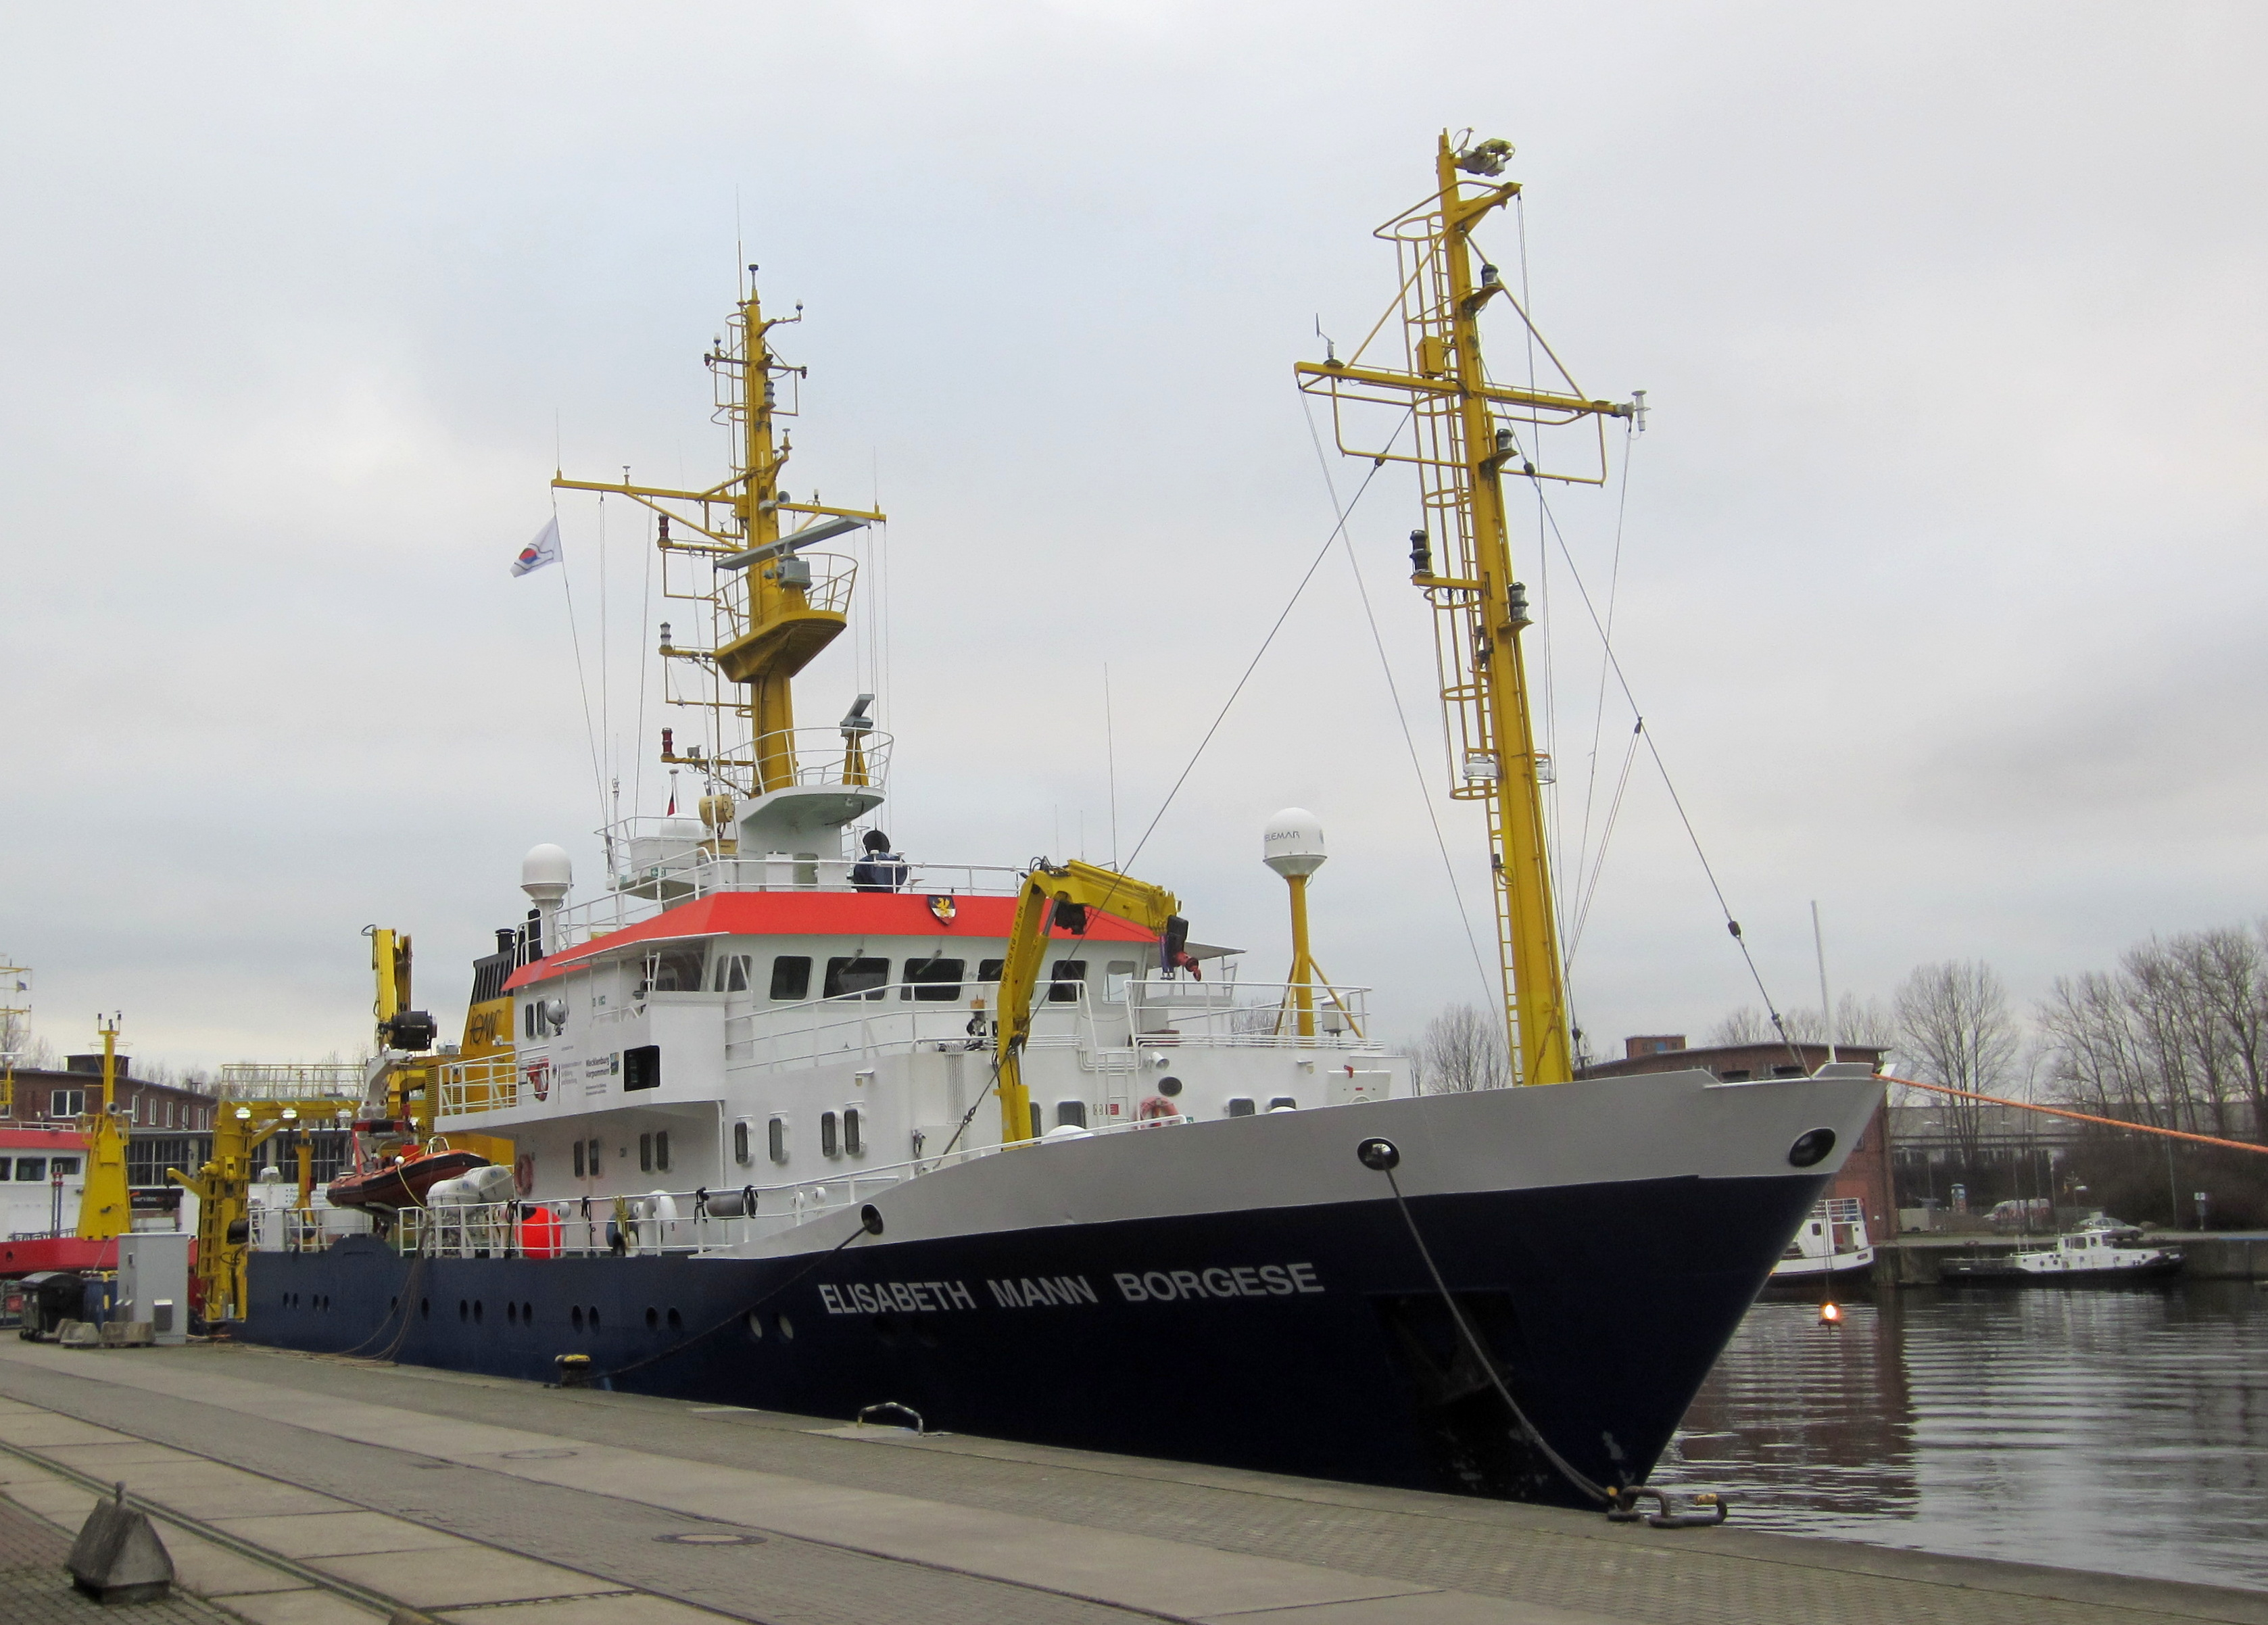 File:RV Elisabeth Mann Borgese in Rostock Januar 2015.JPG ...